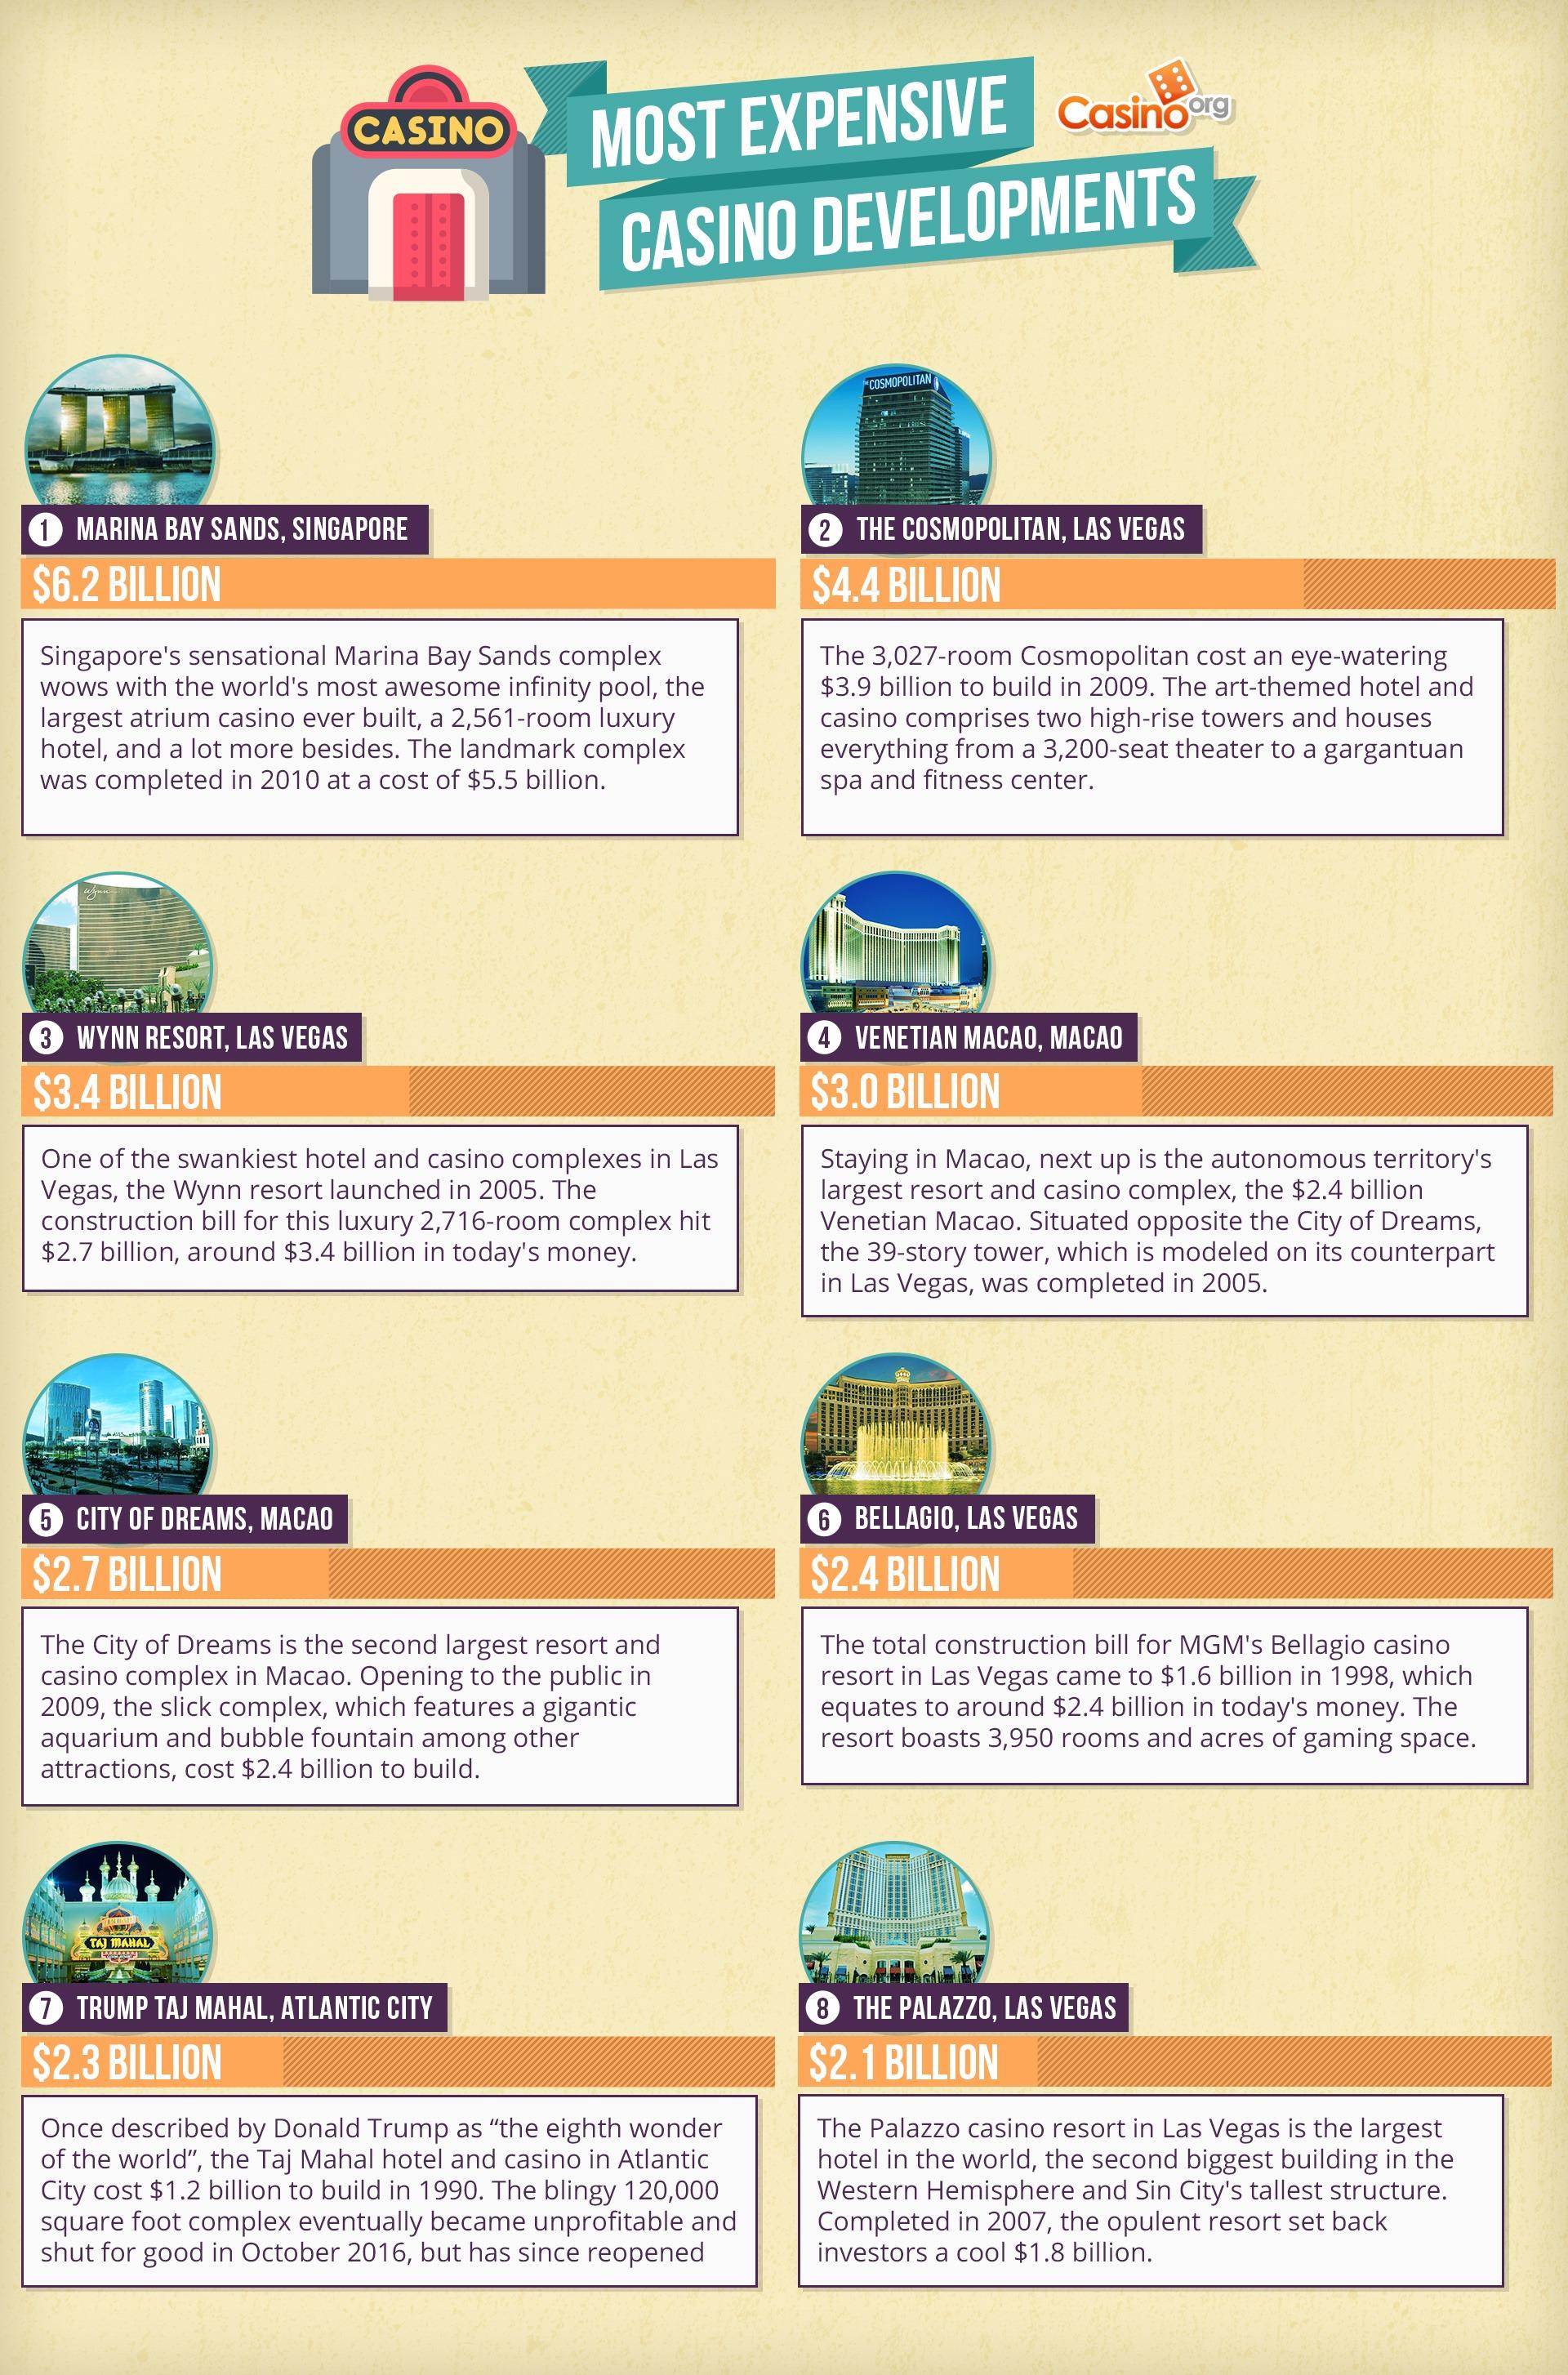 Most expensive casino developments